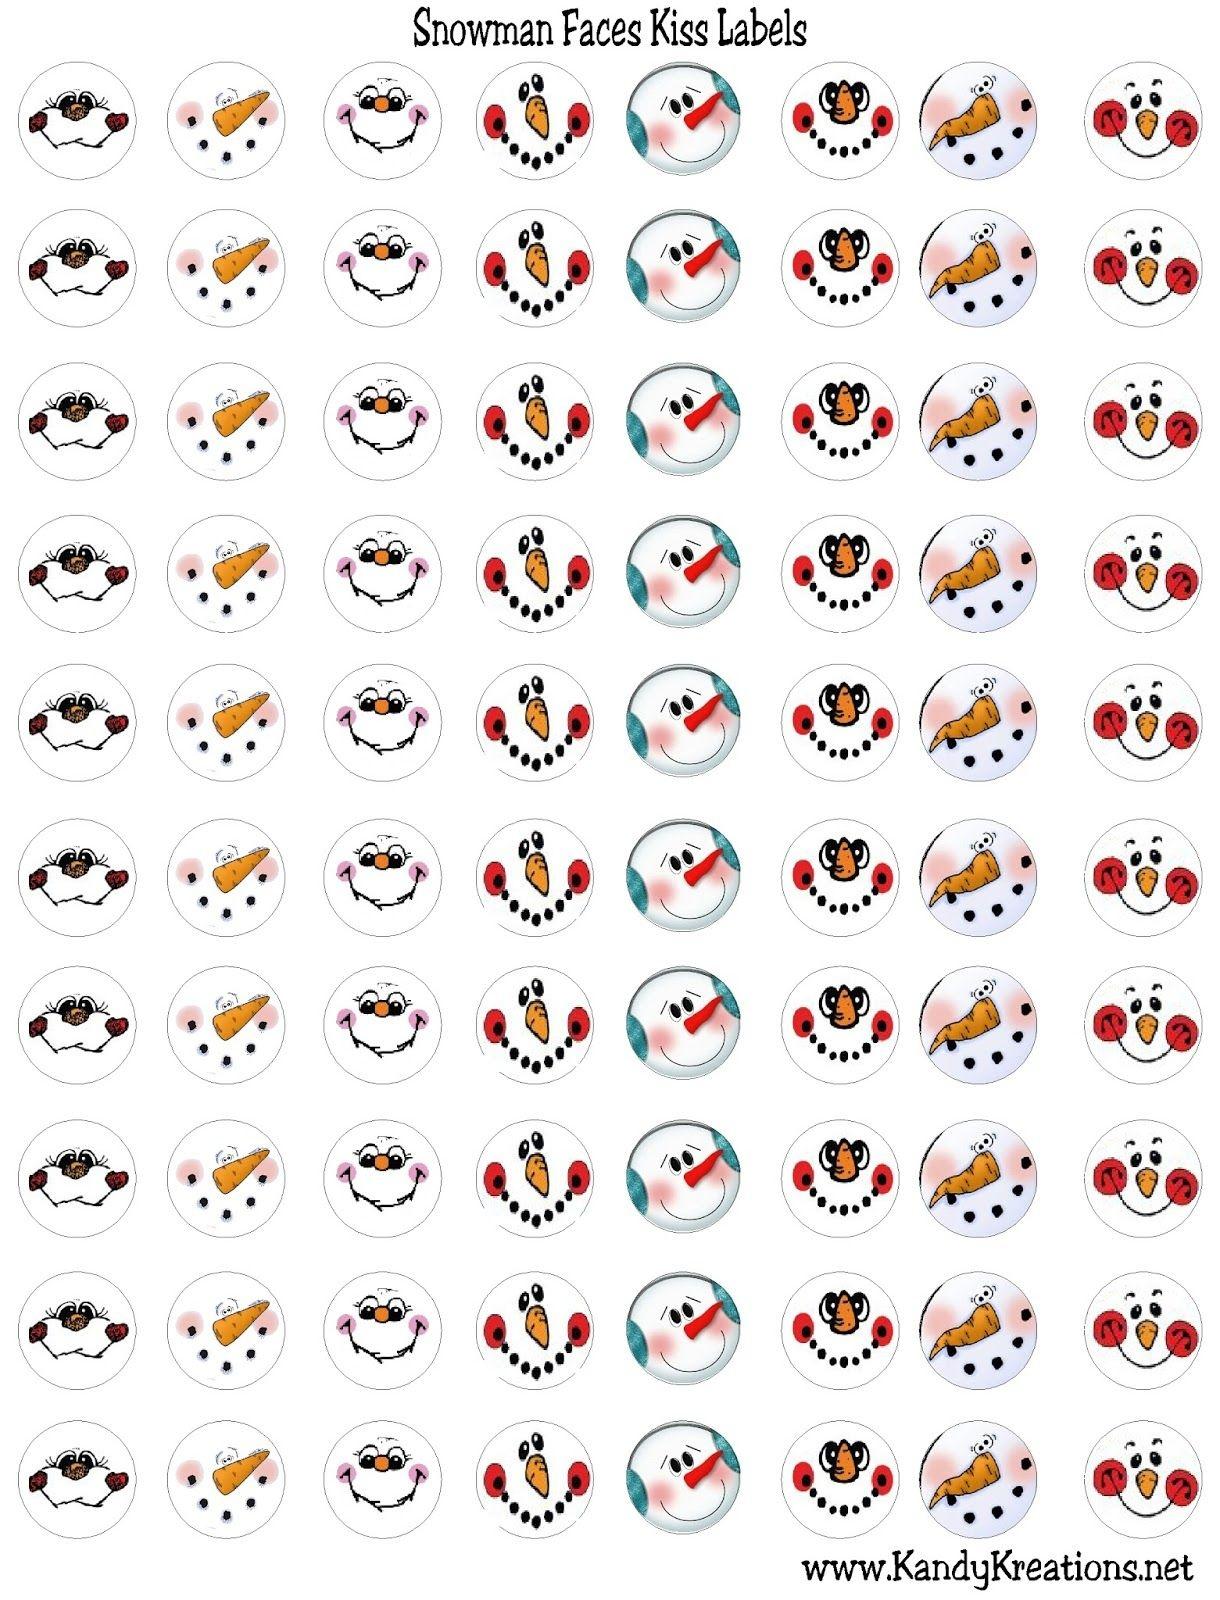 Snowman Faces Kiss Label Free Printable | Planner Stickers | Snowman - Free Printable Snowman Face Stencils